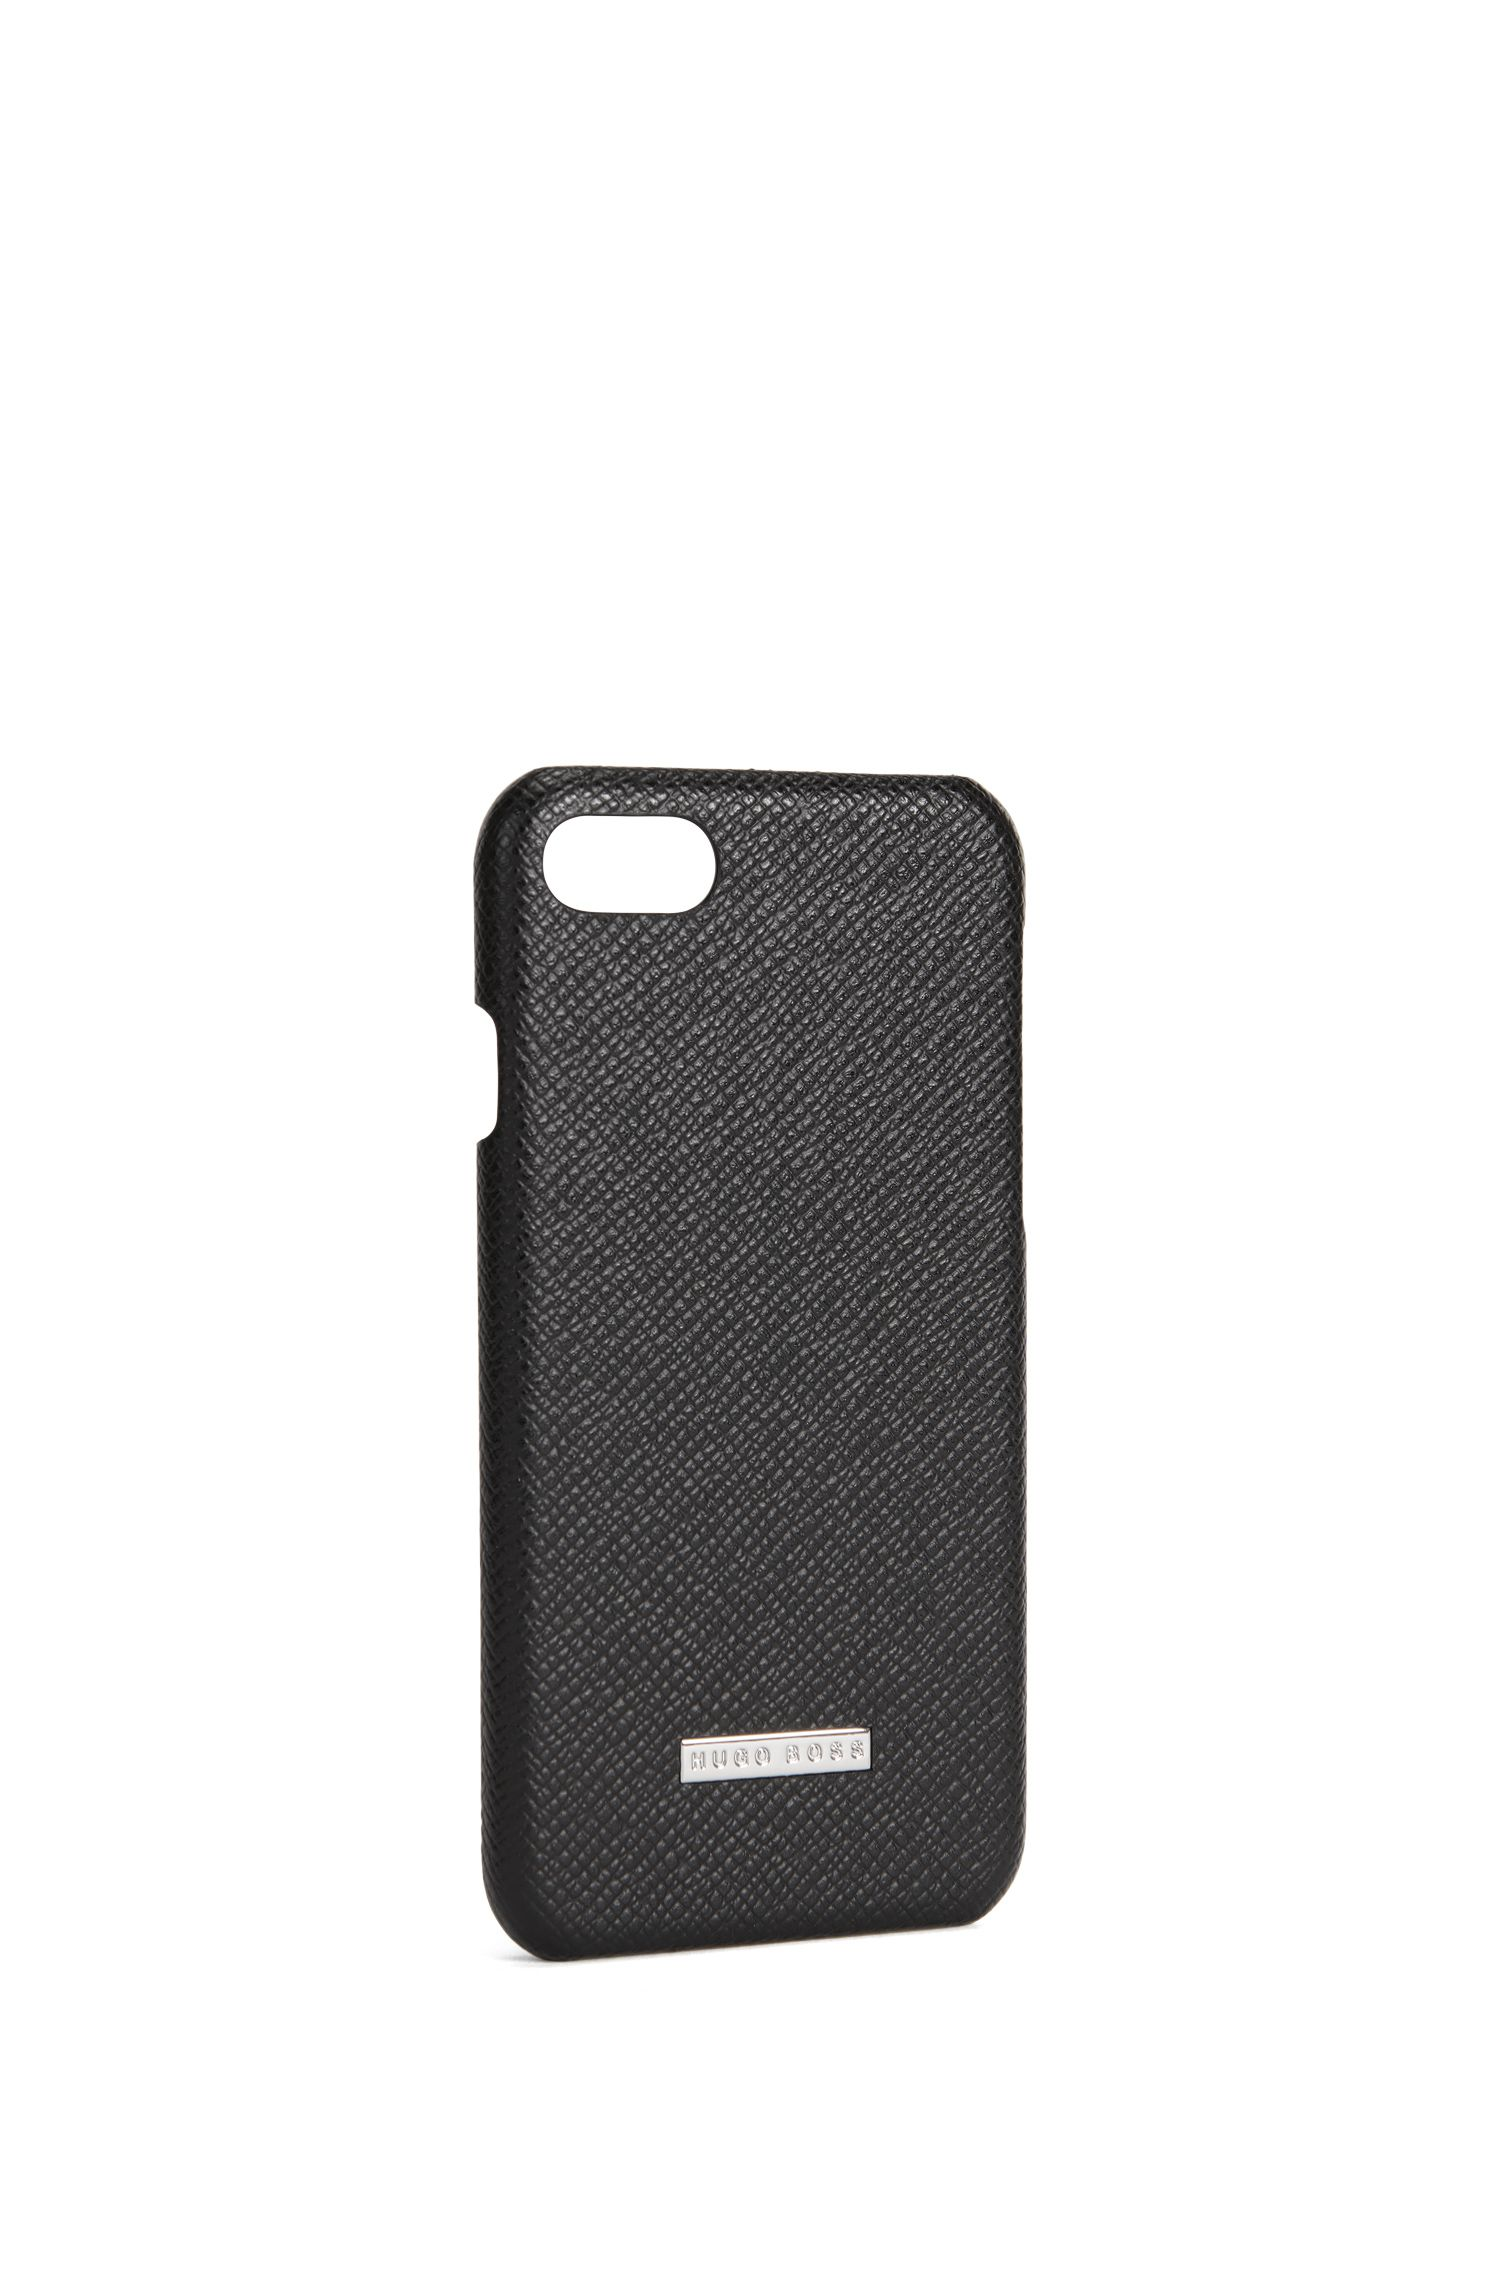 Embossed leather iPhone 7 Case   Signature Phone 7